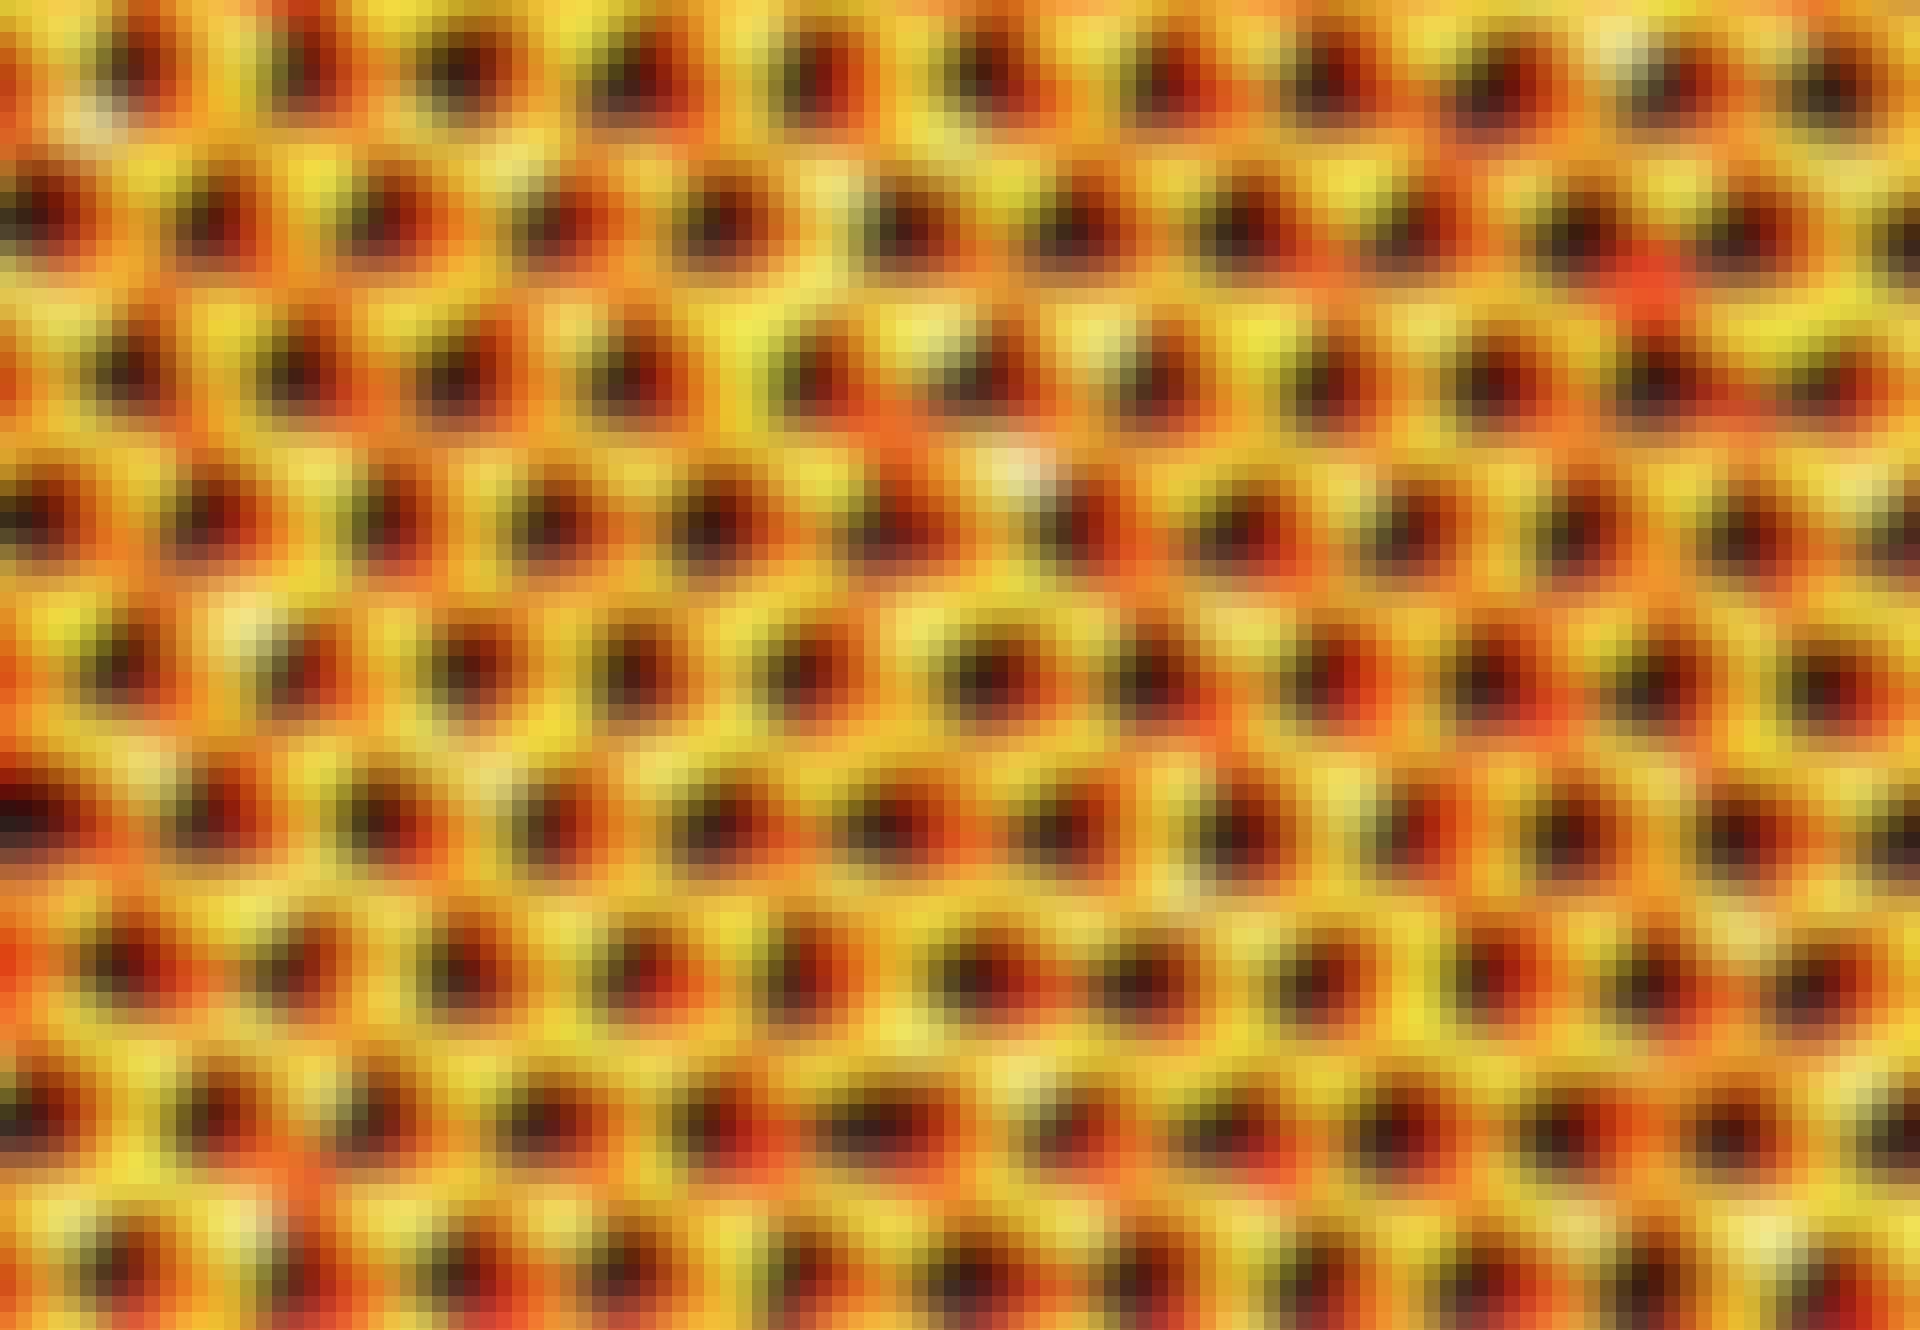 Ihmemateriaali grafeeni